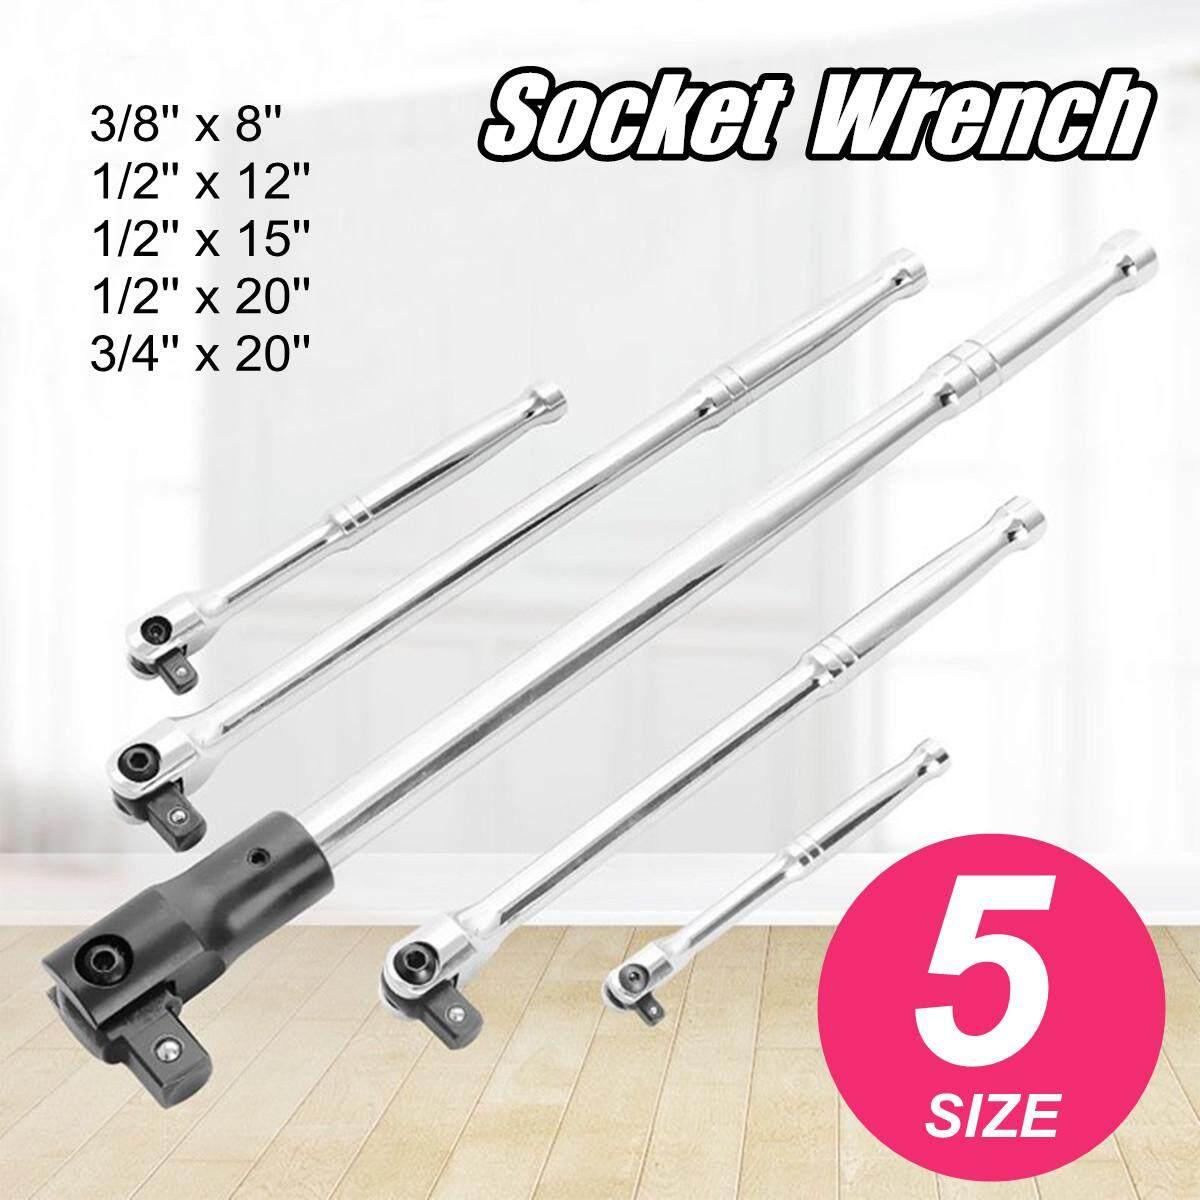 Drive Breaker Bar Rotates 180 Deg Socket Wrench Ratchet Hand Tool # 3/8 x 8